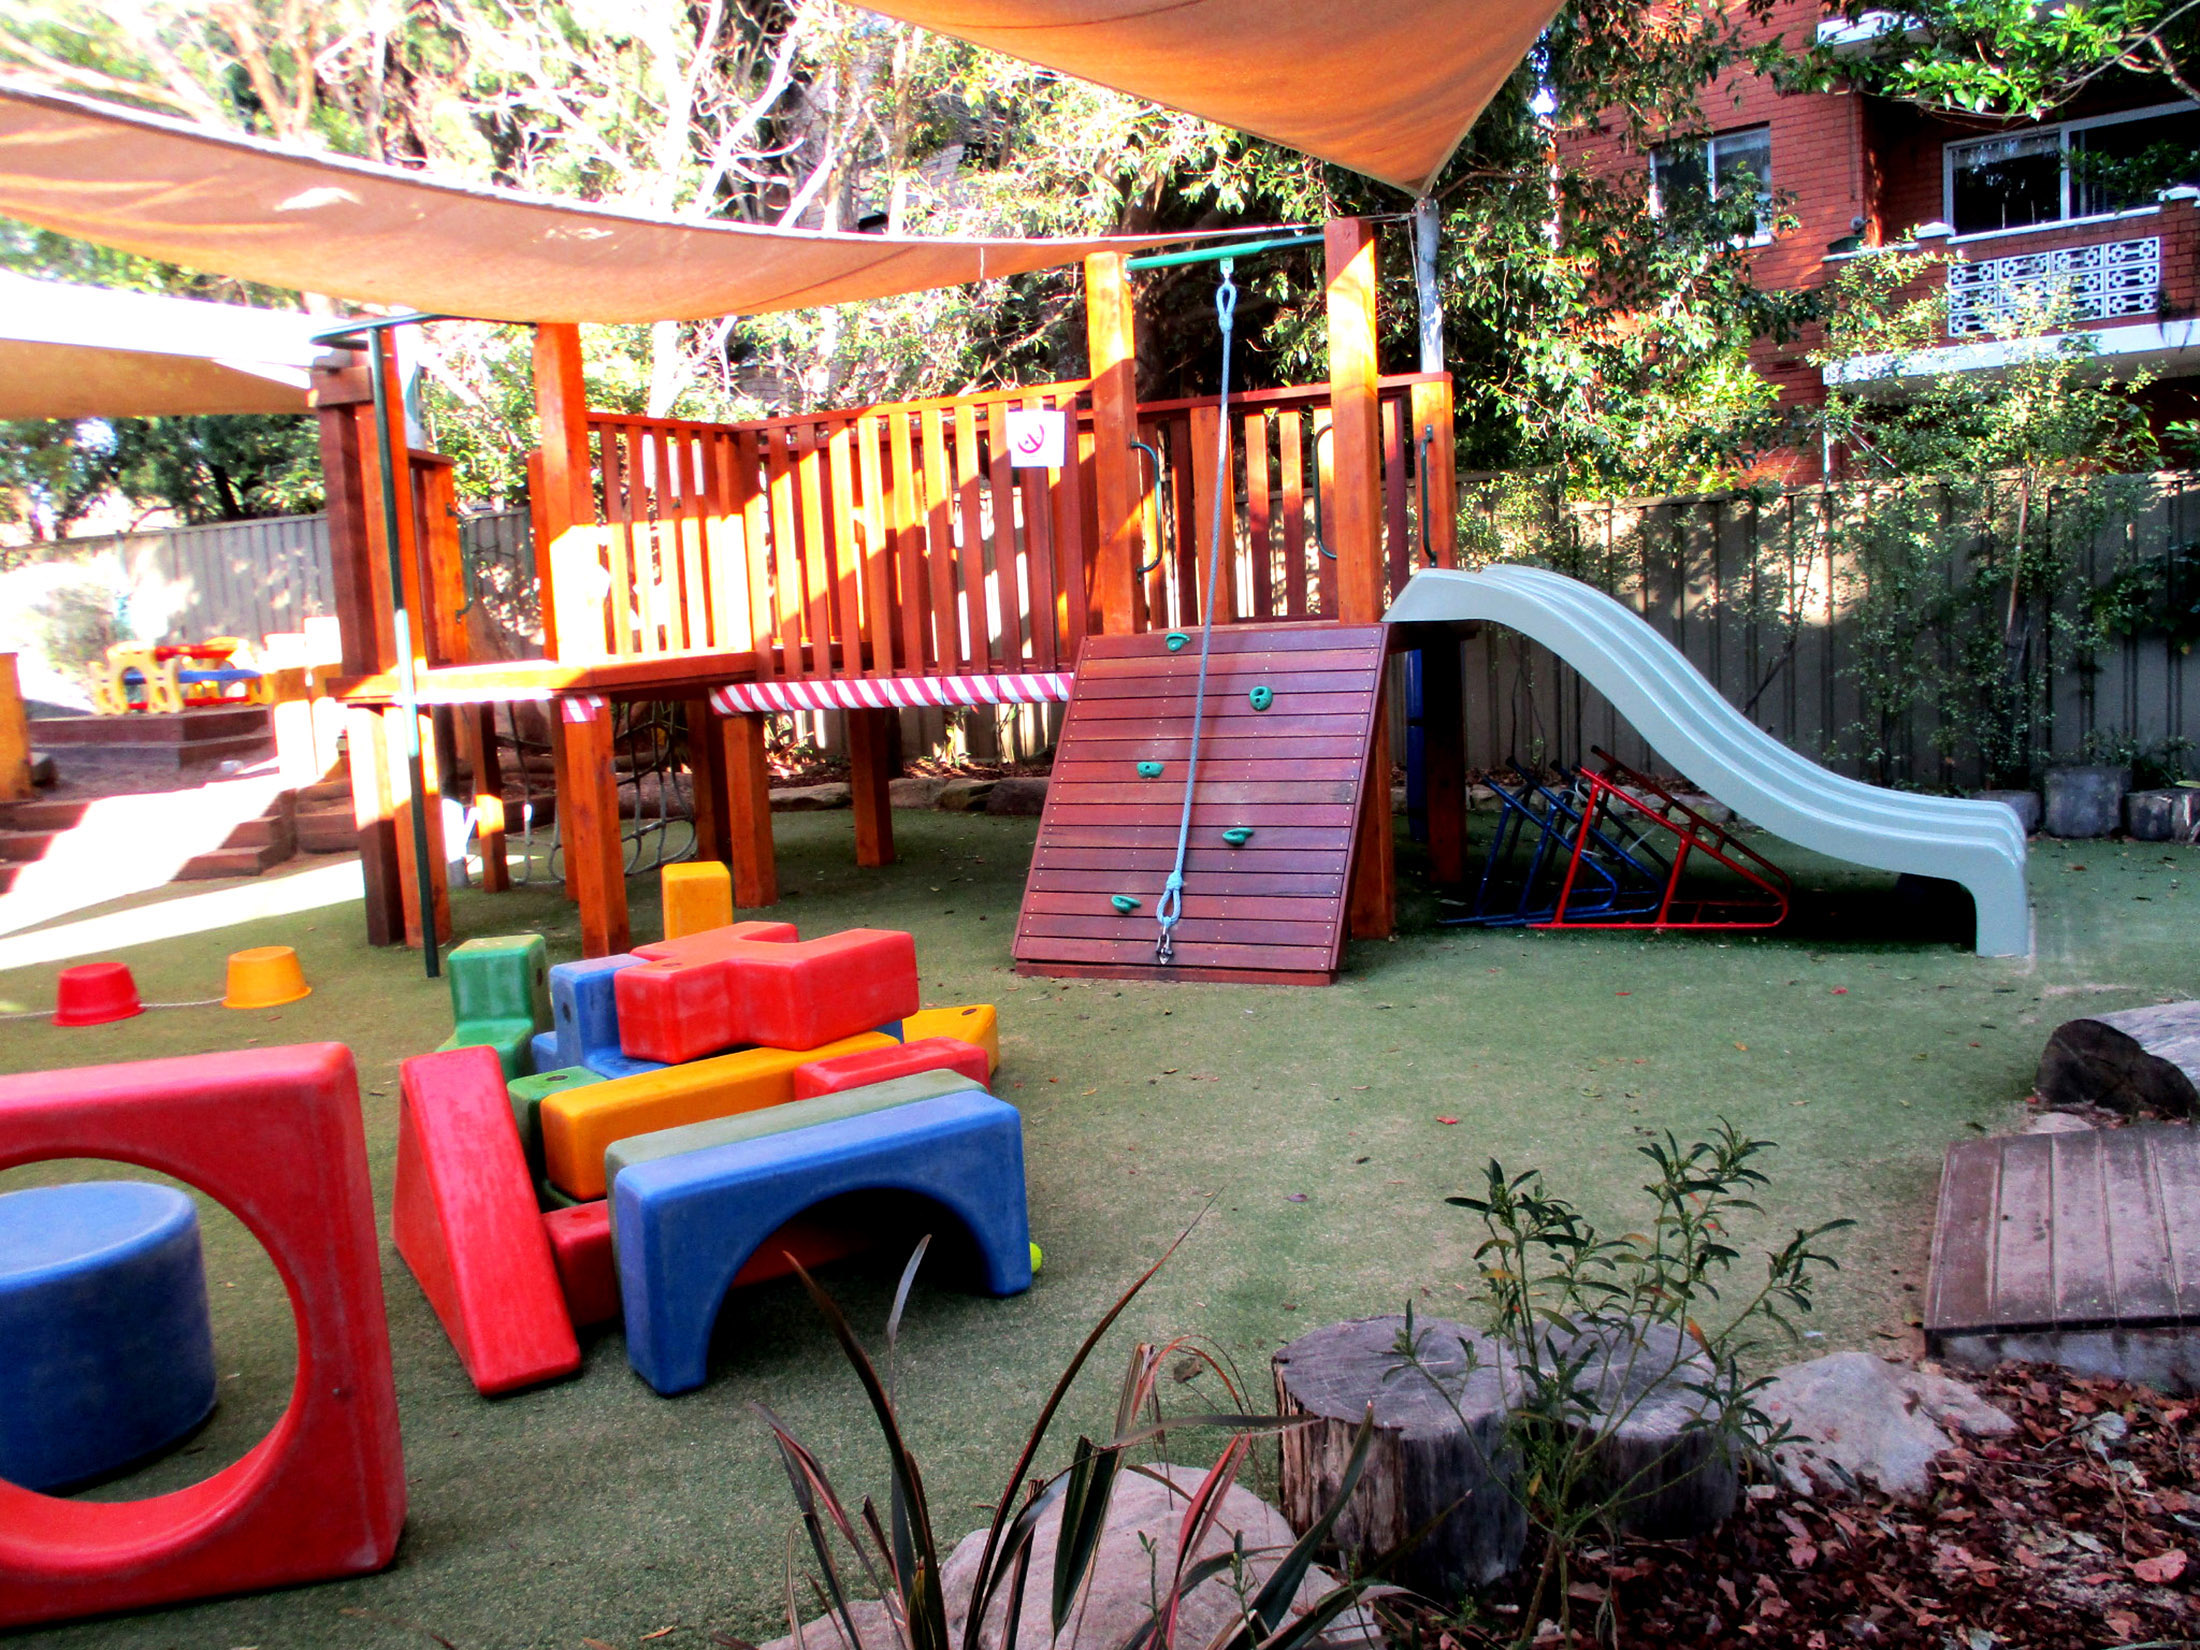 Playground in sun